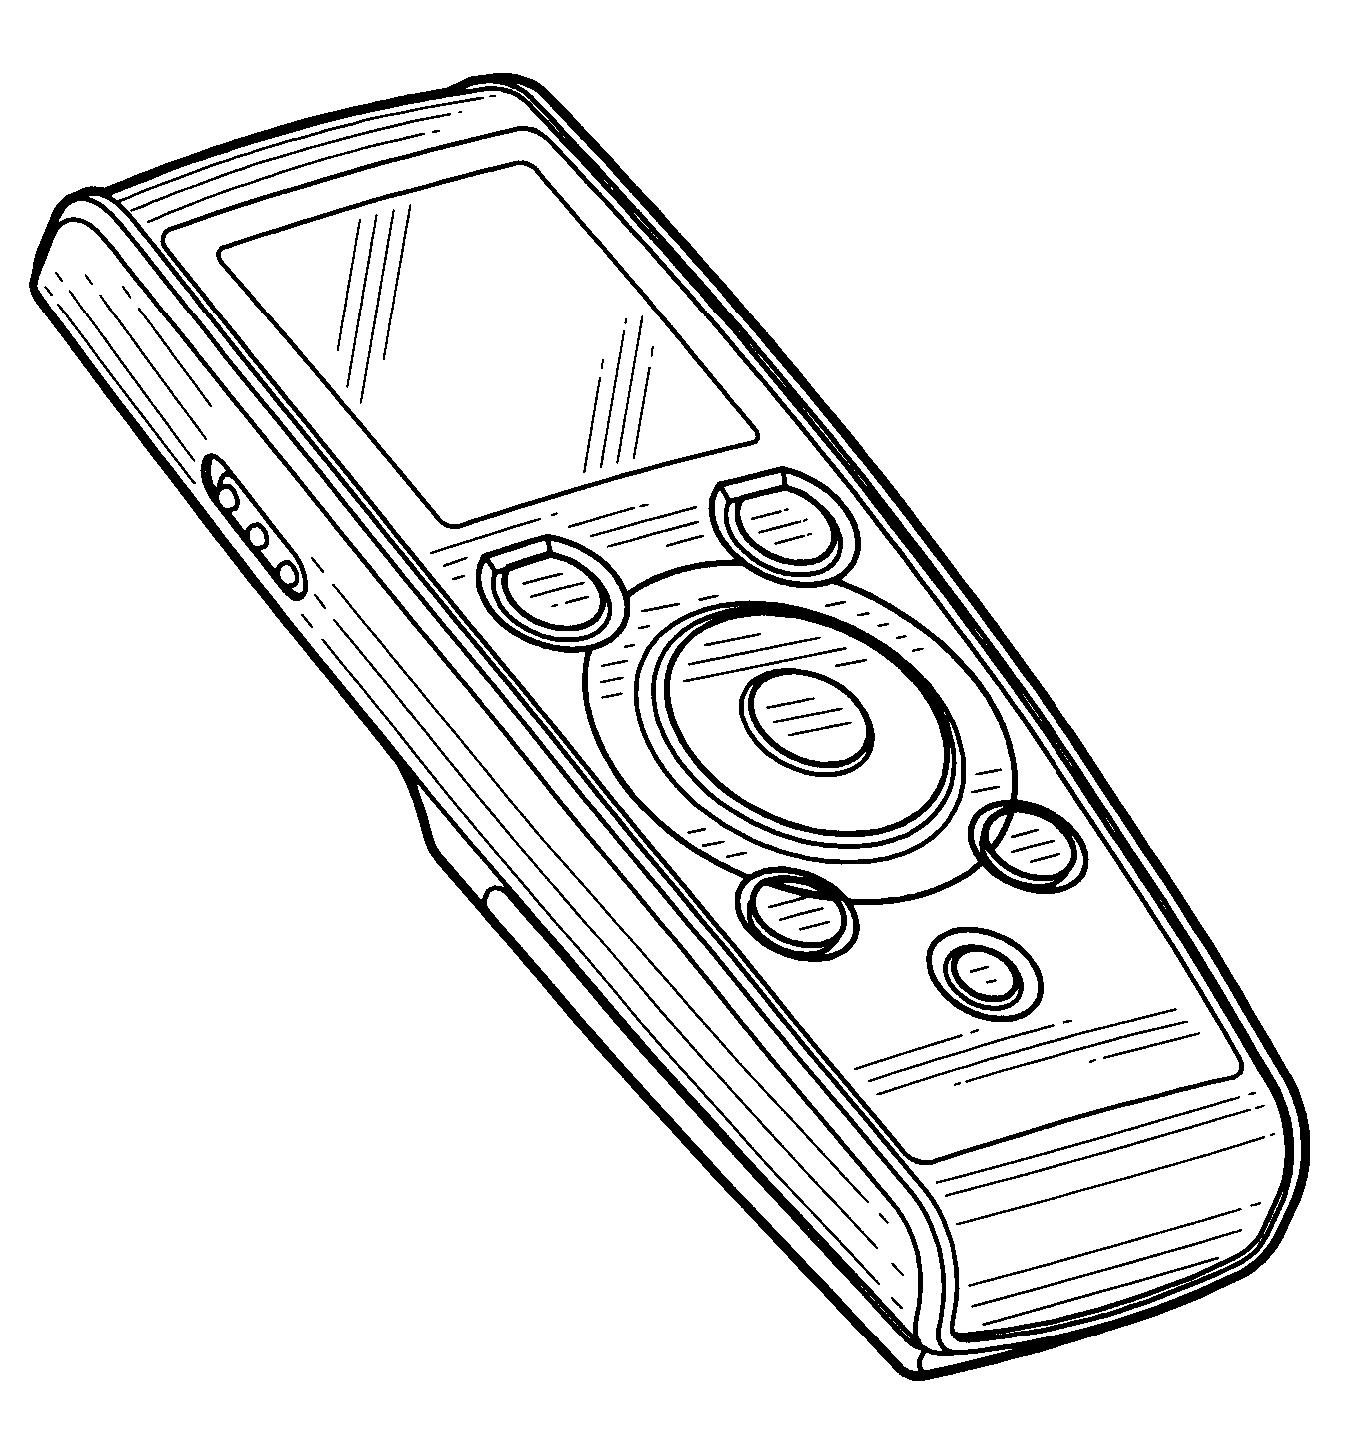 patent usd538779 - digital voice recorder